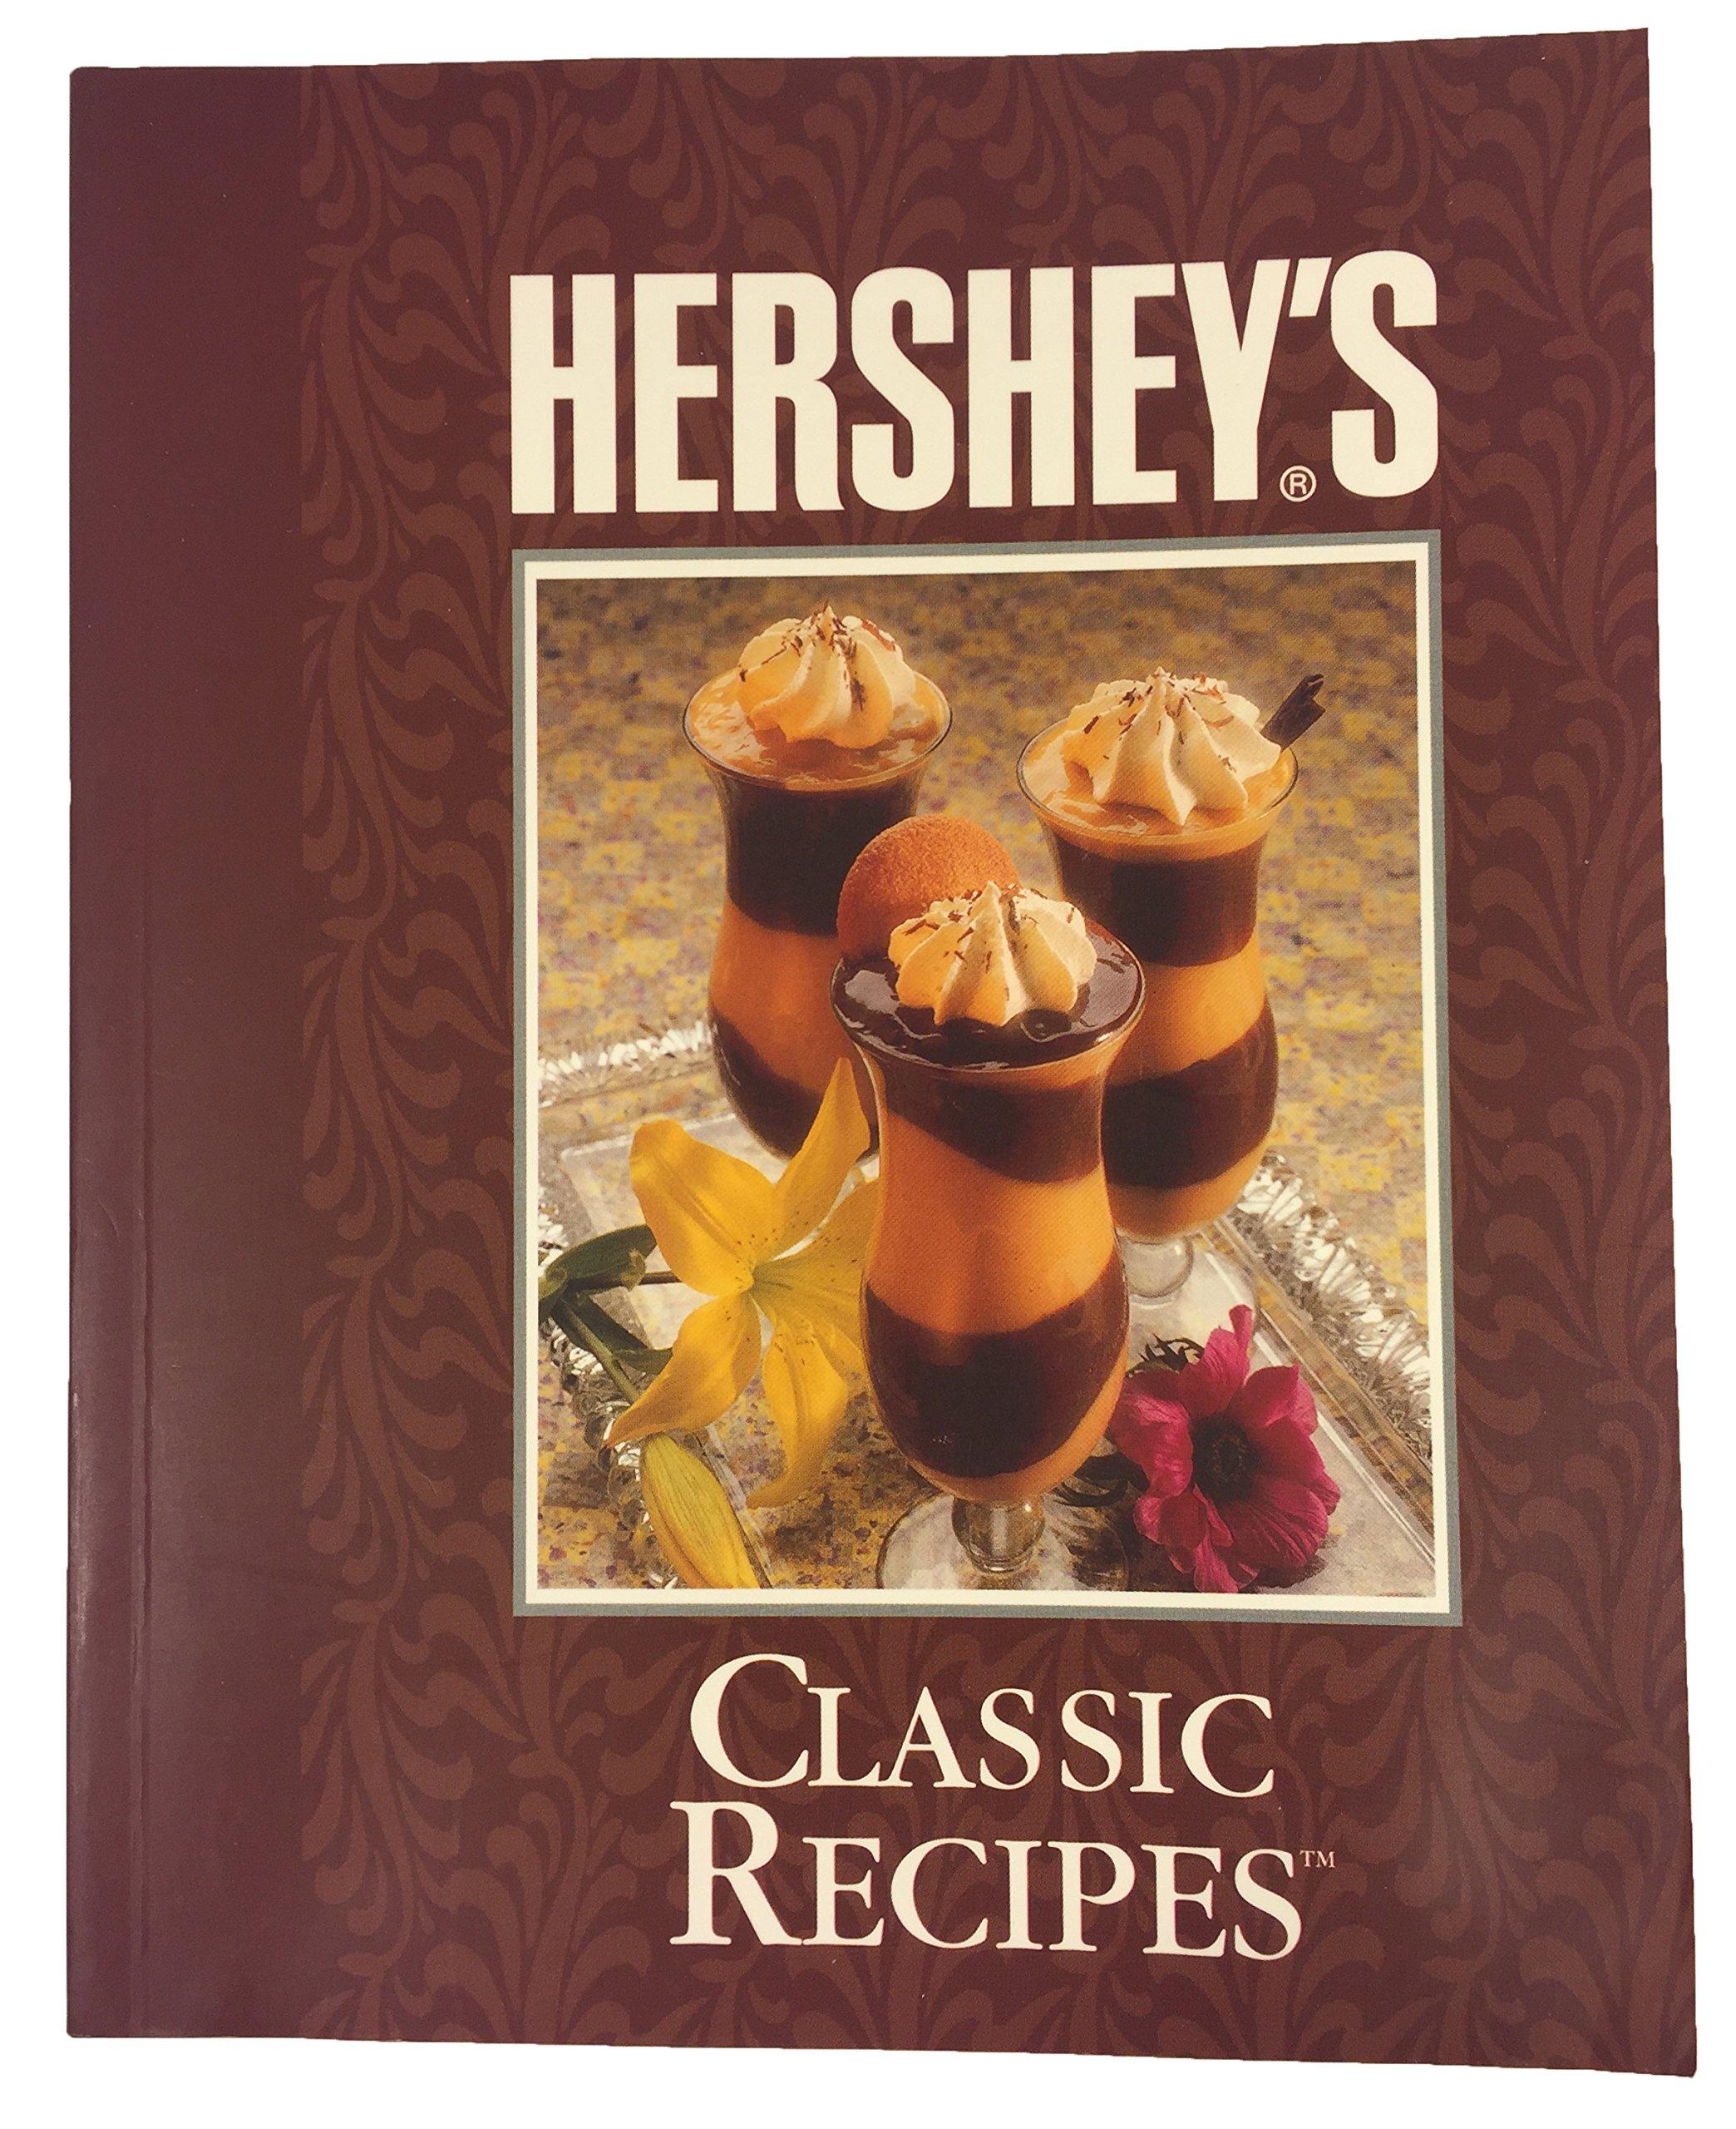 Hershey's Classic Recipes ebook